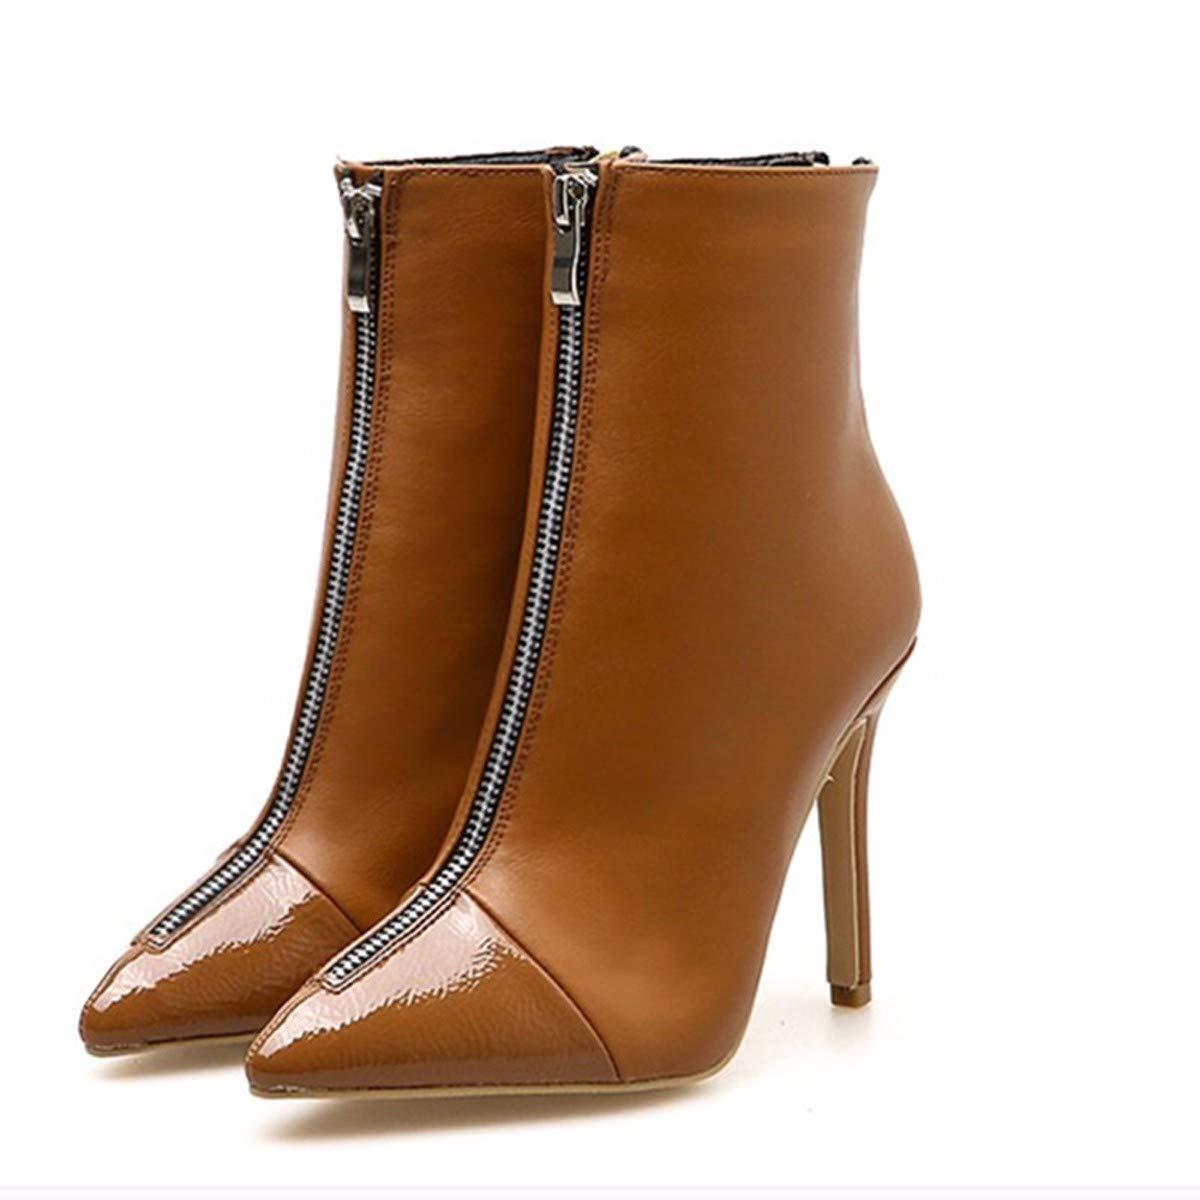 LBTSQ-Mode/Damenschuhe/Kurze Stiefel Mit Hohen 10Cm Dünne Sohle Stiefeletten Wies Kopf Kurzen Schlauch Single - Reißverschluss Ma Dingxue.